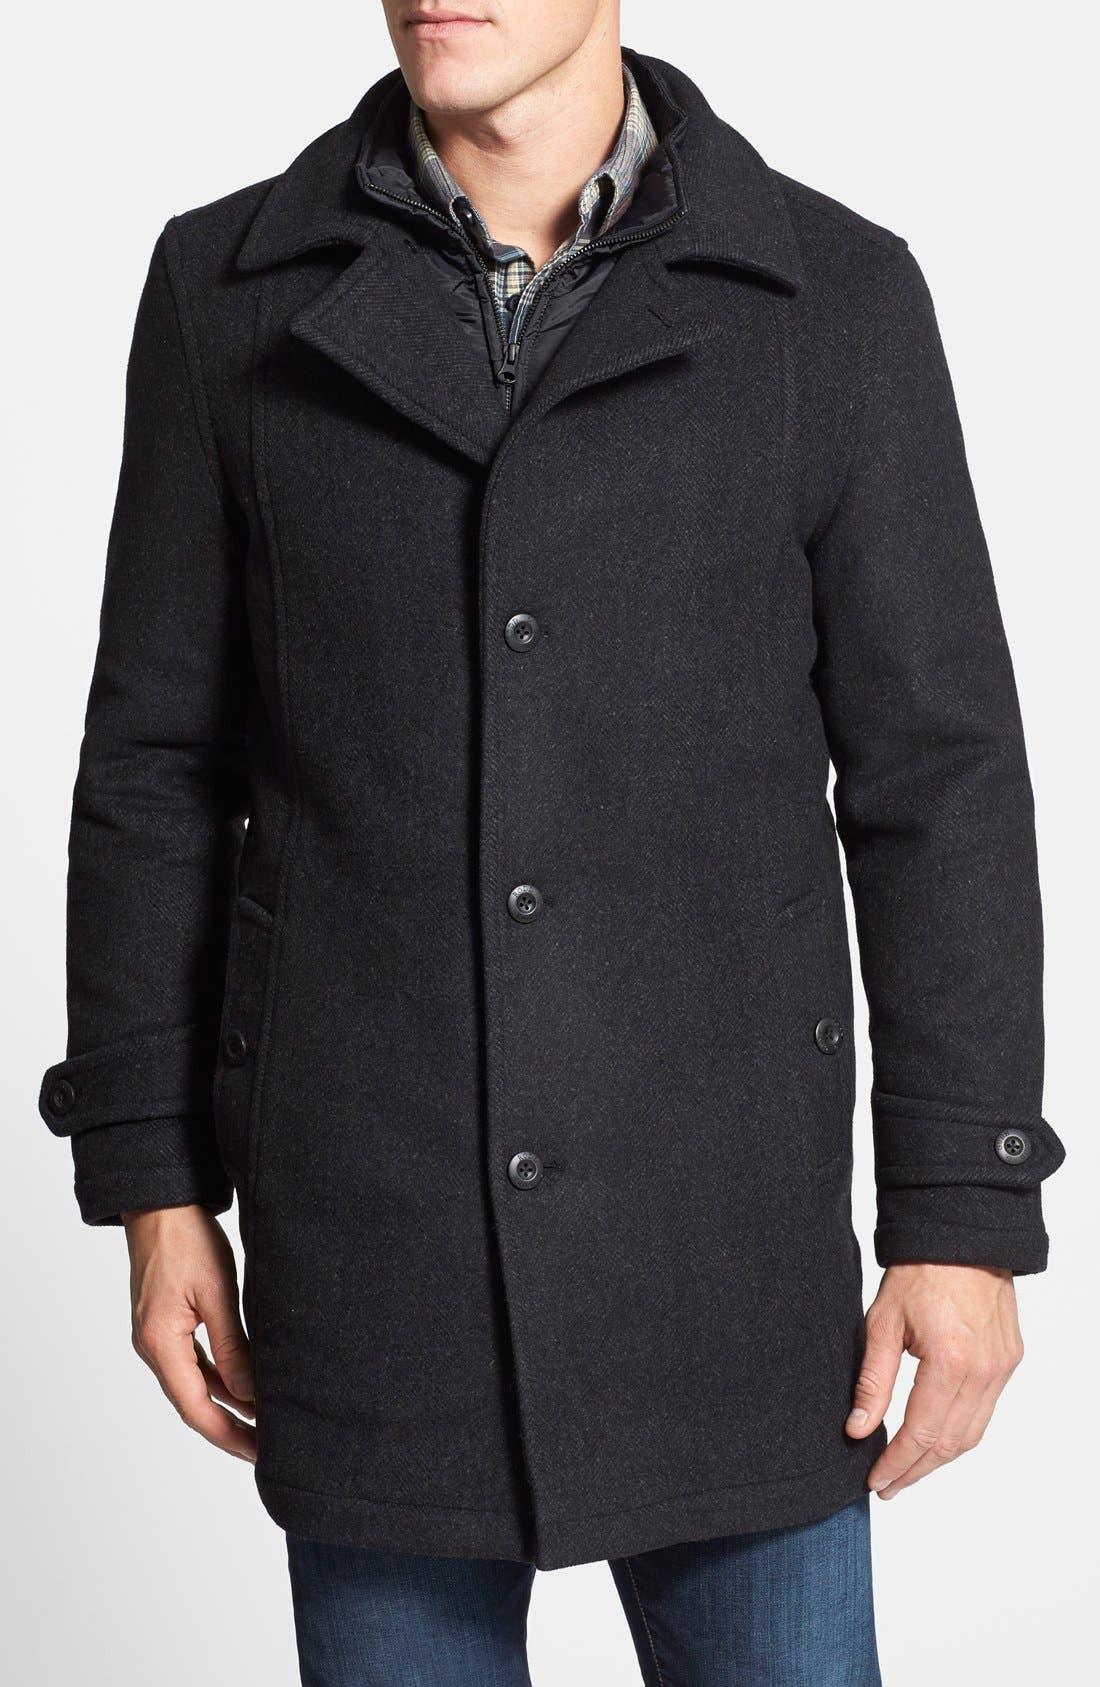 Main Image - Rodd & Gunn 'Westown' 3-in-1 Wool Blend Coat